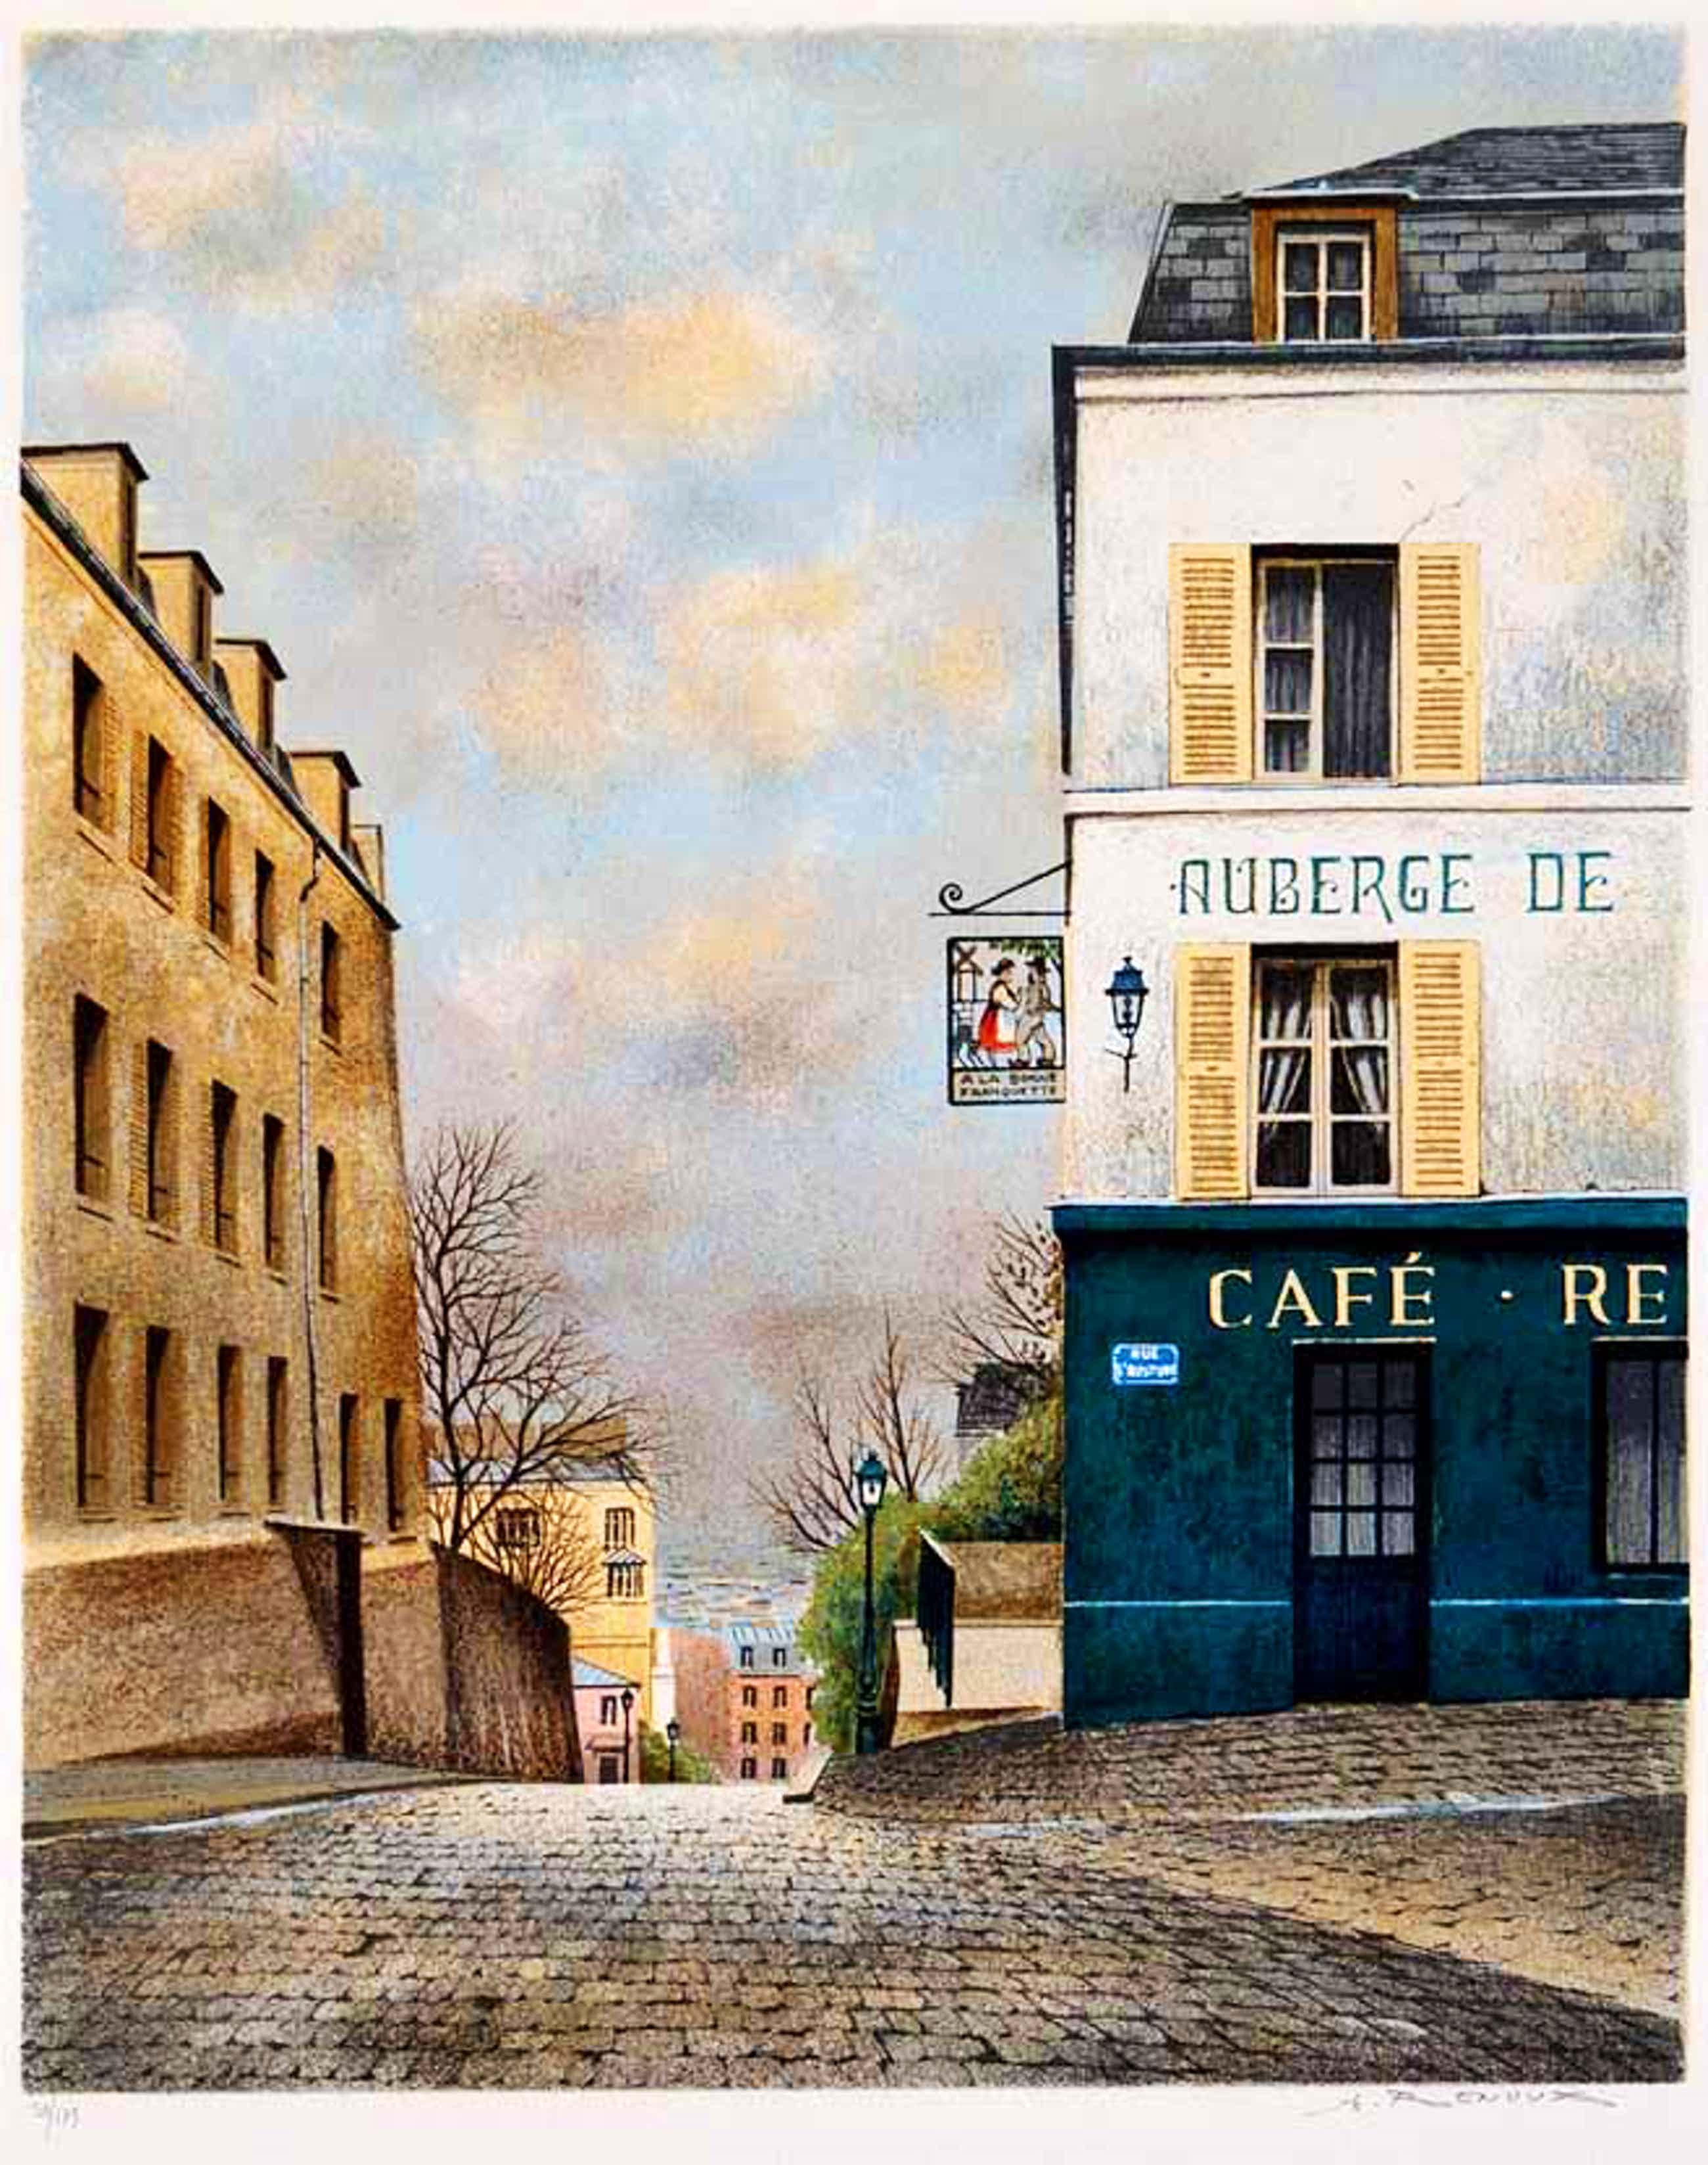 Andre Renoux - 1939-2002, Farb-Stein-Lithografie signiert kopen? Bied vanaf 75!